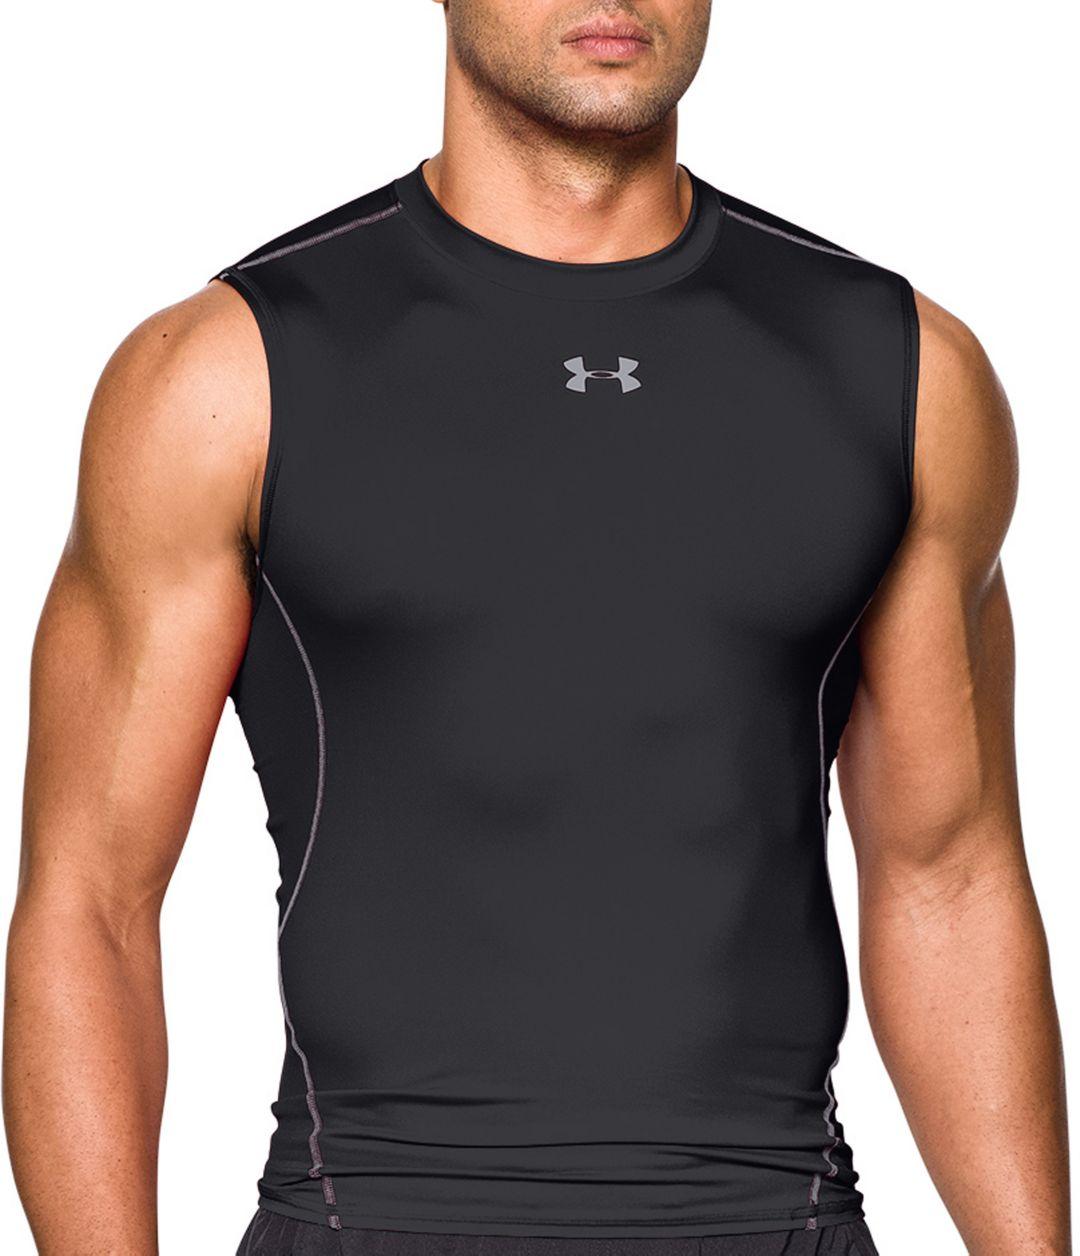 e5acfe6b Under Armour Men's HeatGear Armour Sleeveless Shirt